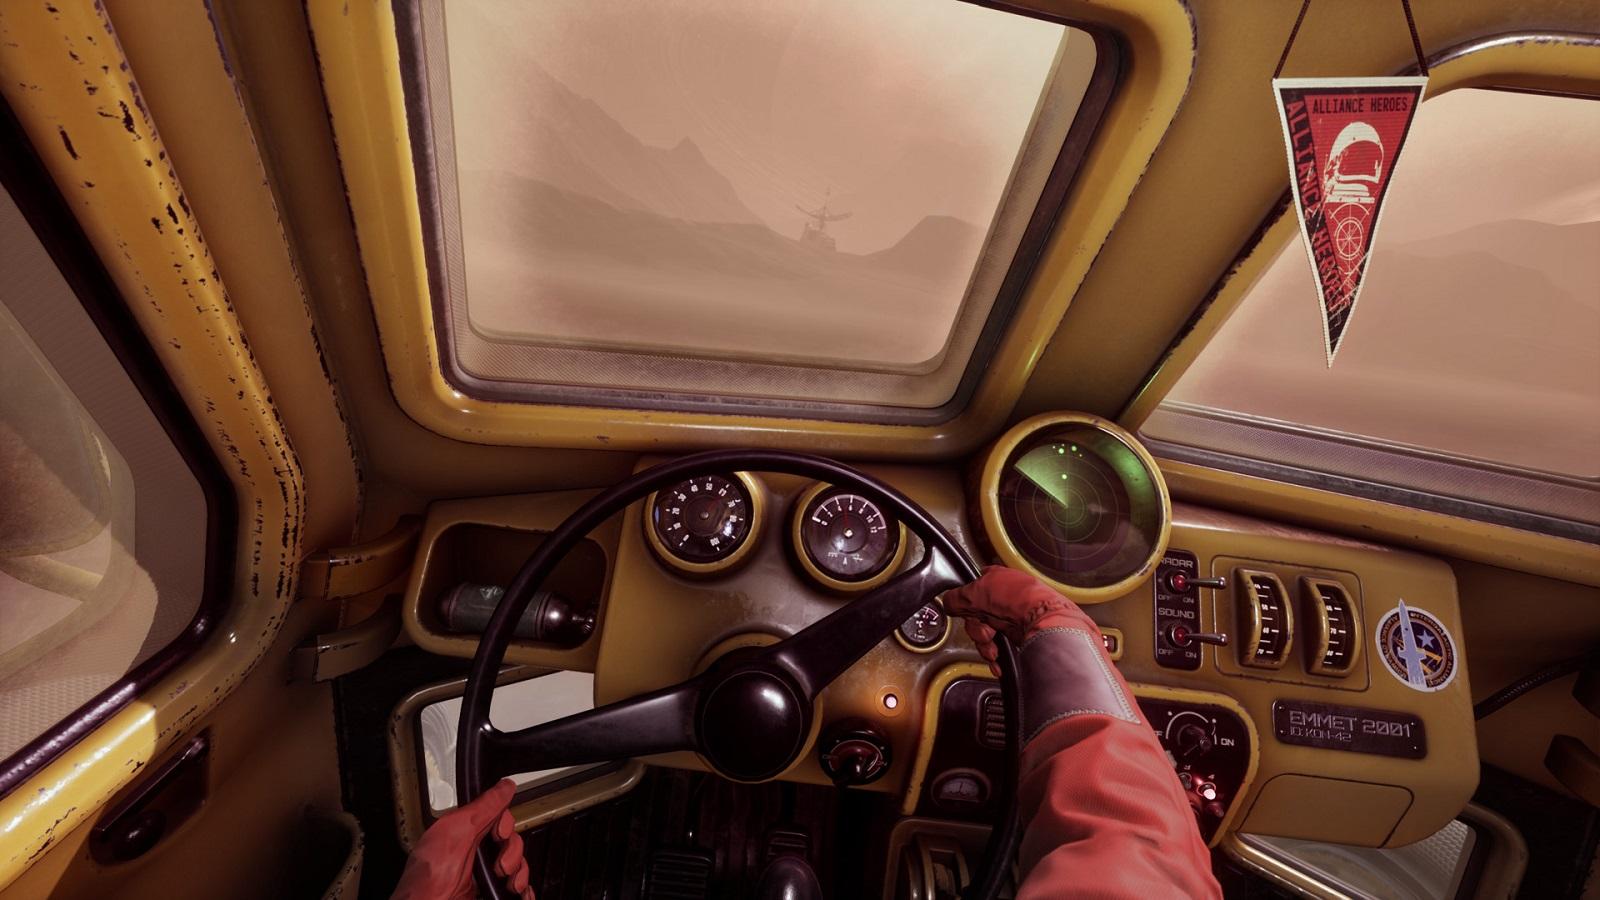 Бывшие сотрудники CD Projekt RED и Techland анонсировали приключение The Invincible по роману Станислава Лема - 03